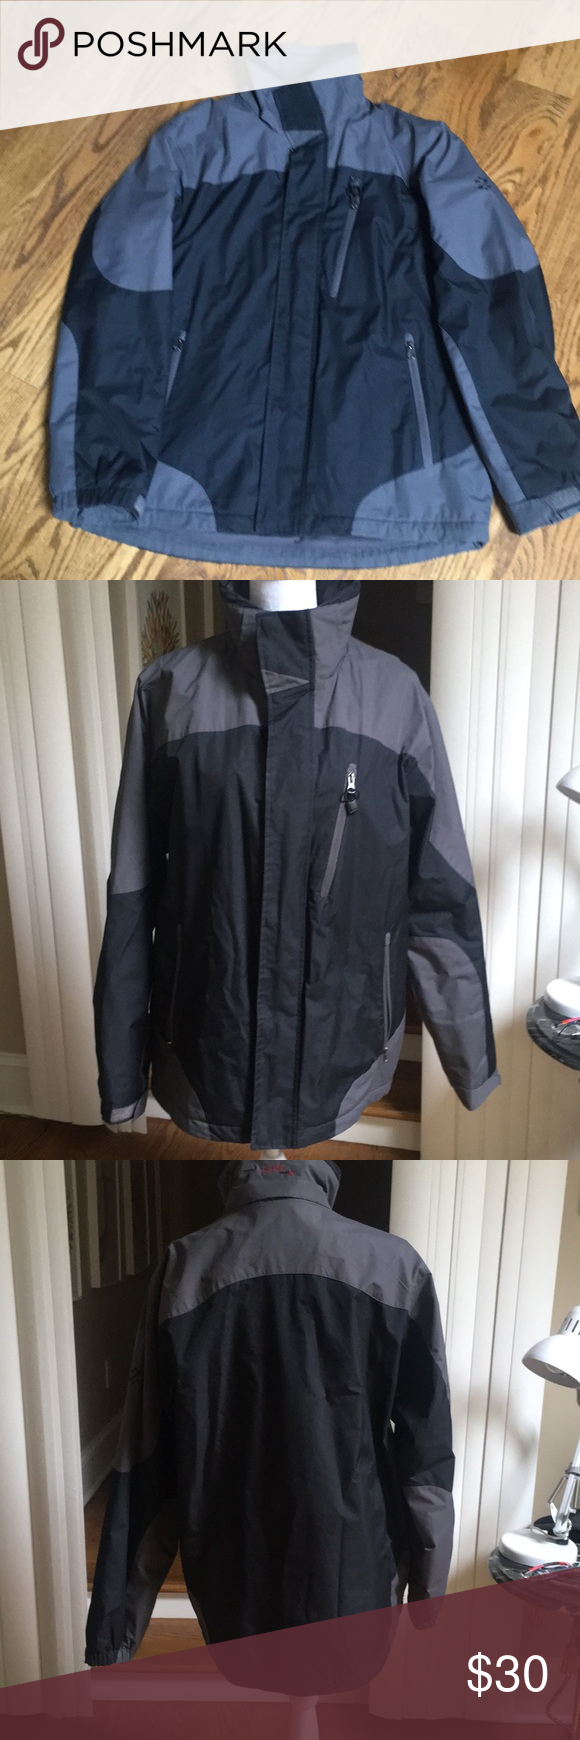 Men S Izod Performance Jacket Size Small Clothes Design Jackets Izod [ 1740 x 580 Pixel ]